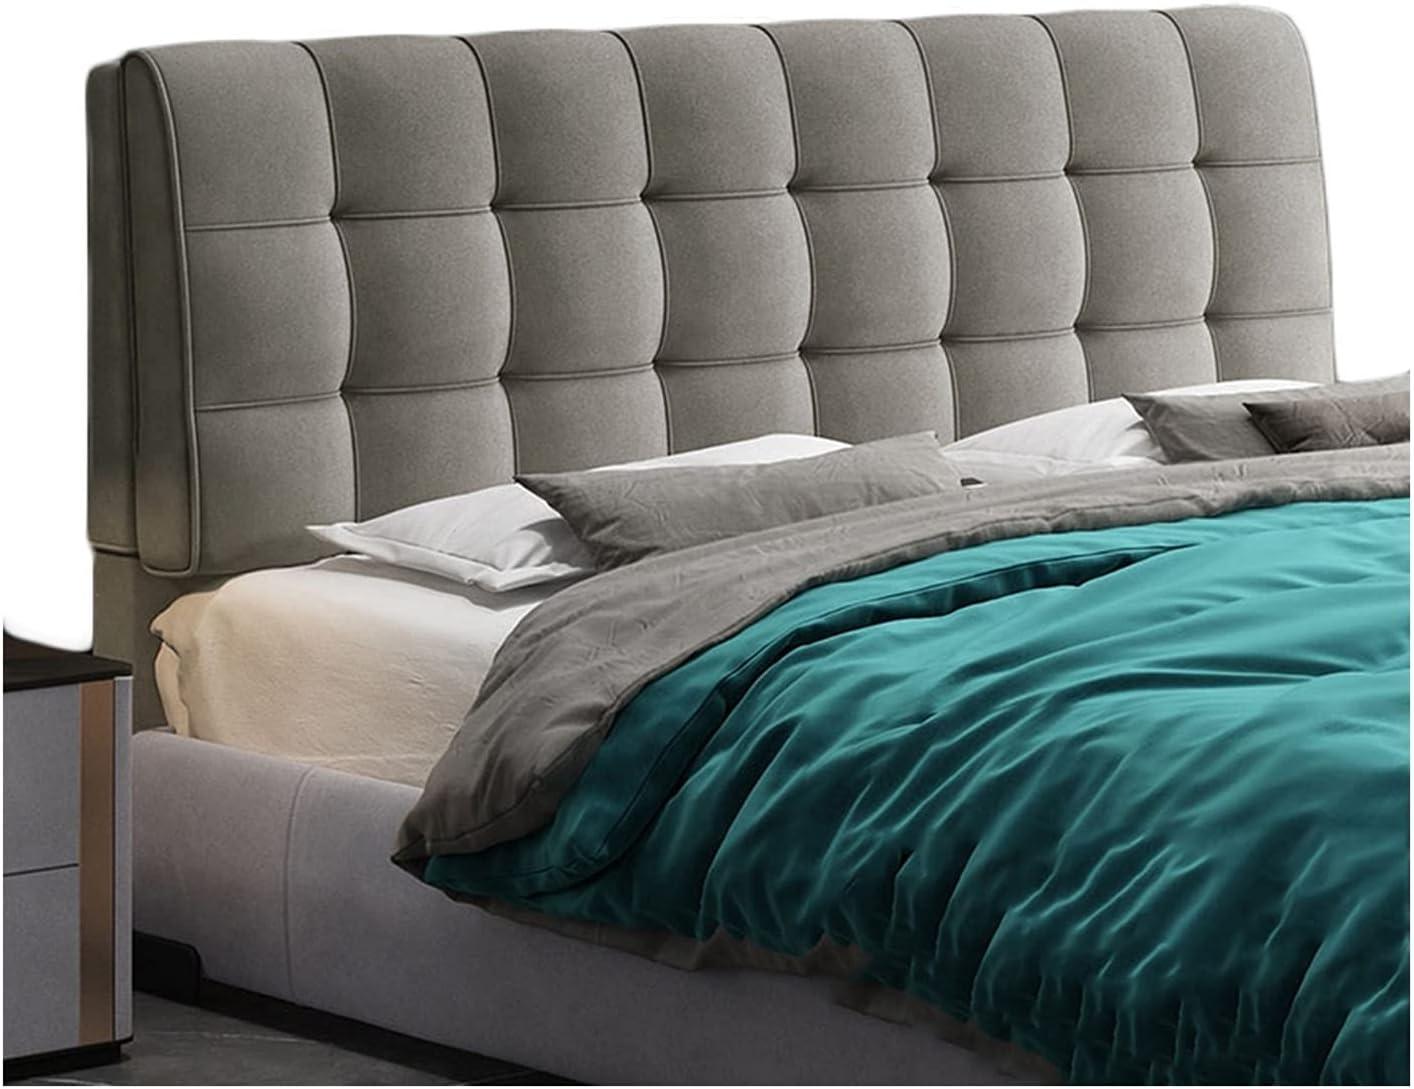 LIANGJUN Headboard Bed Backrest Brand Cheap Sale Venue Reading Tucson Mall Fabric Pillow Cushion